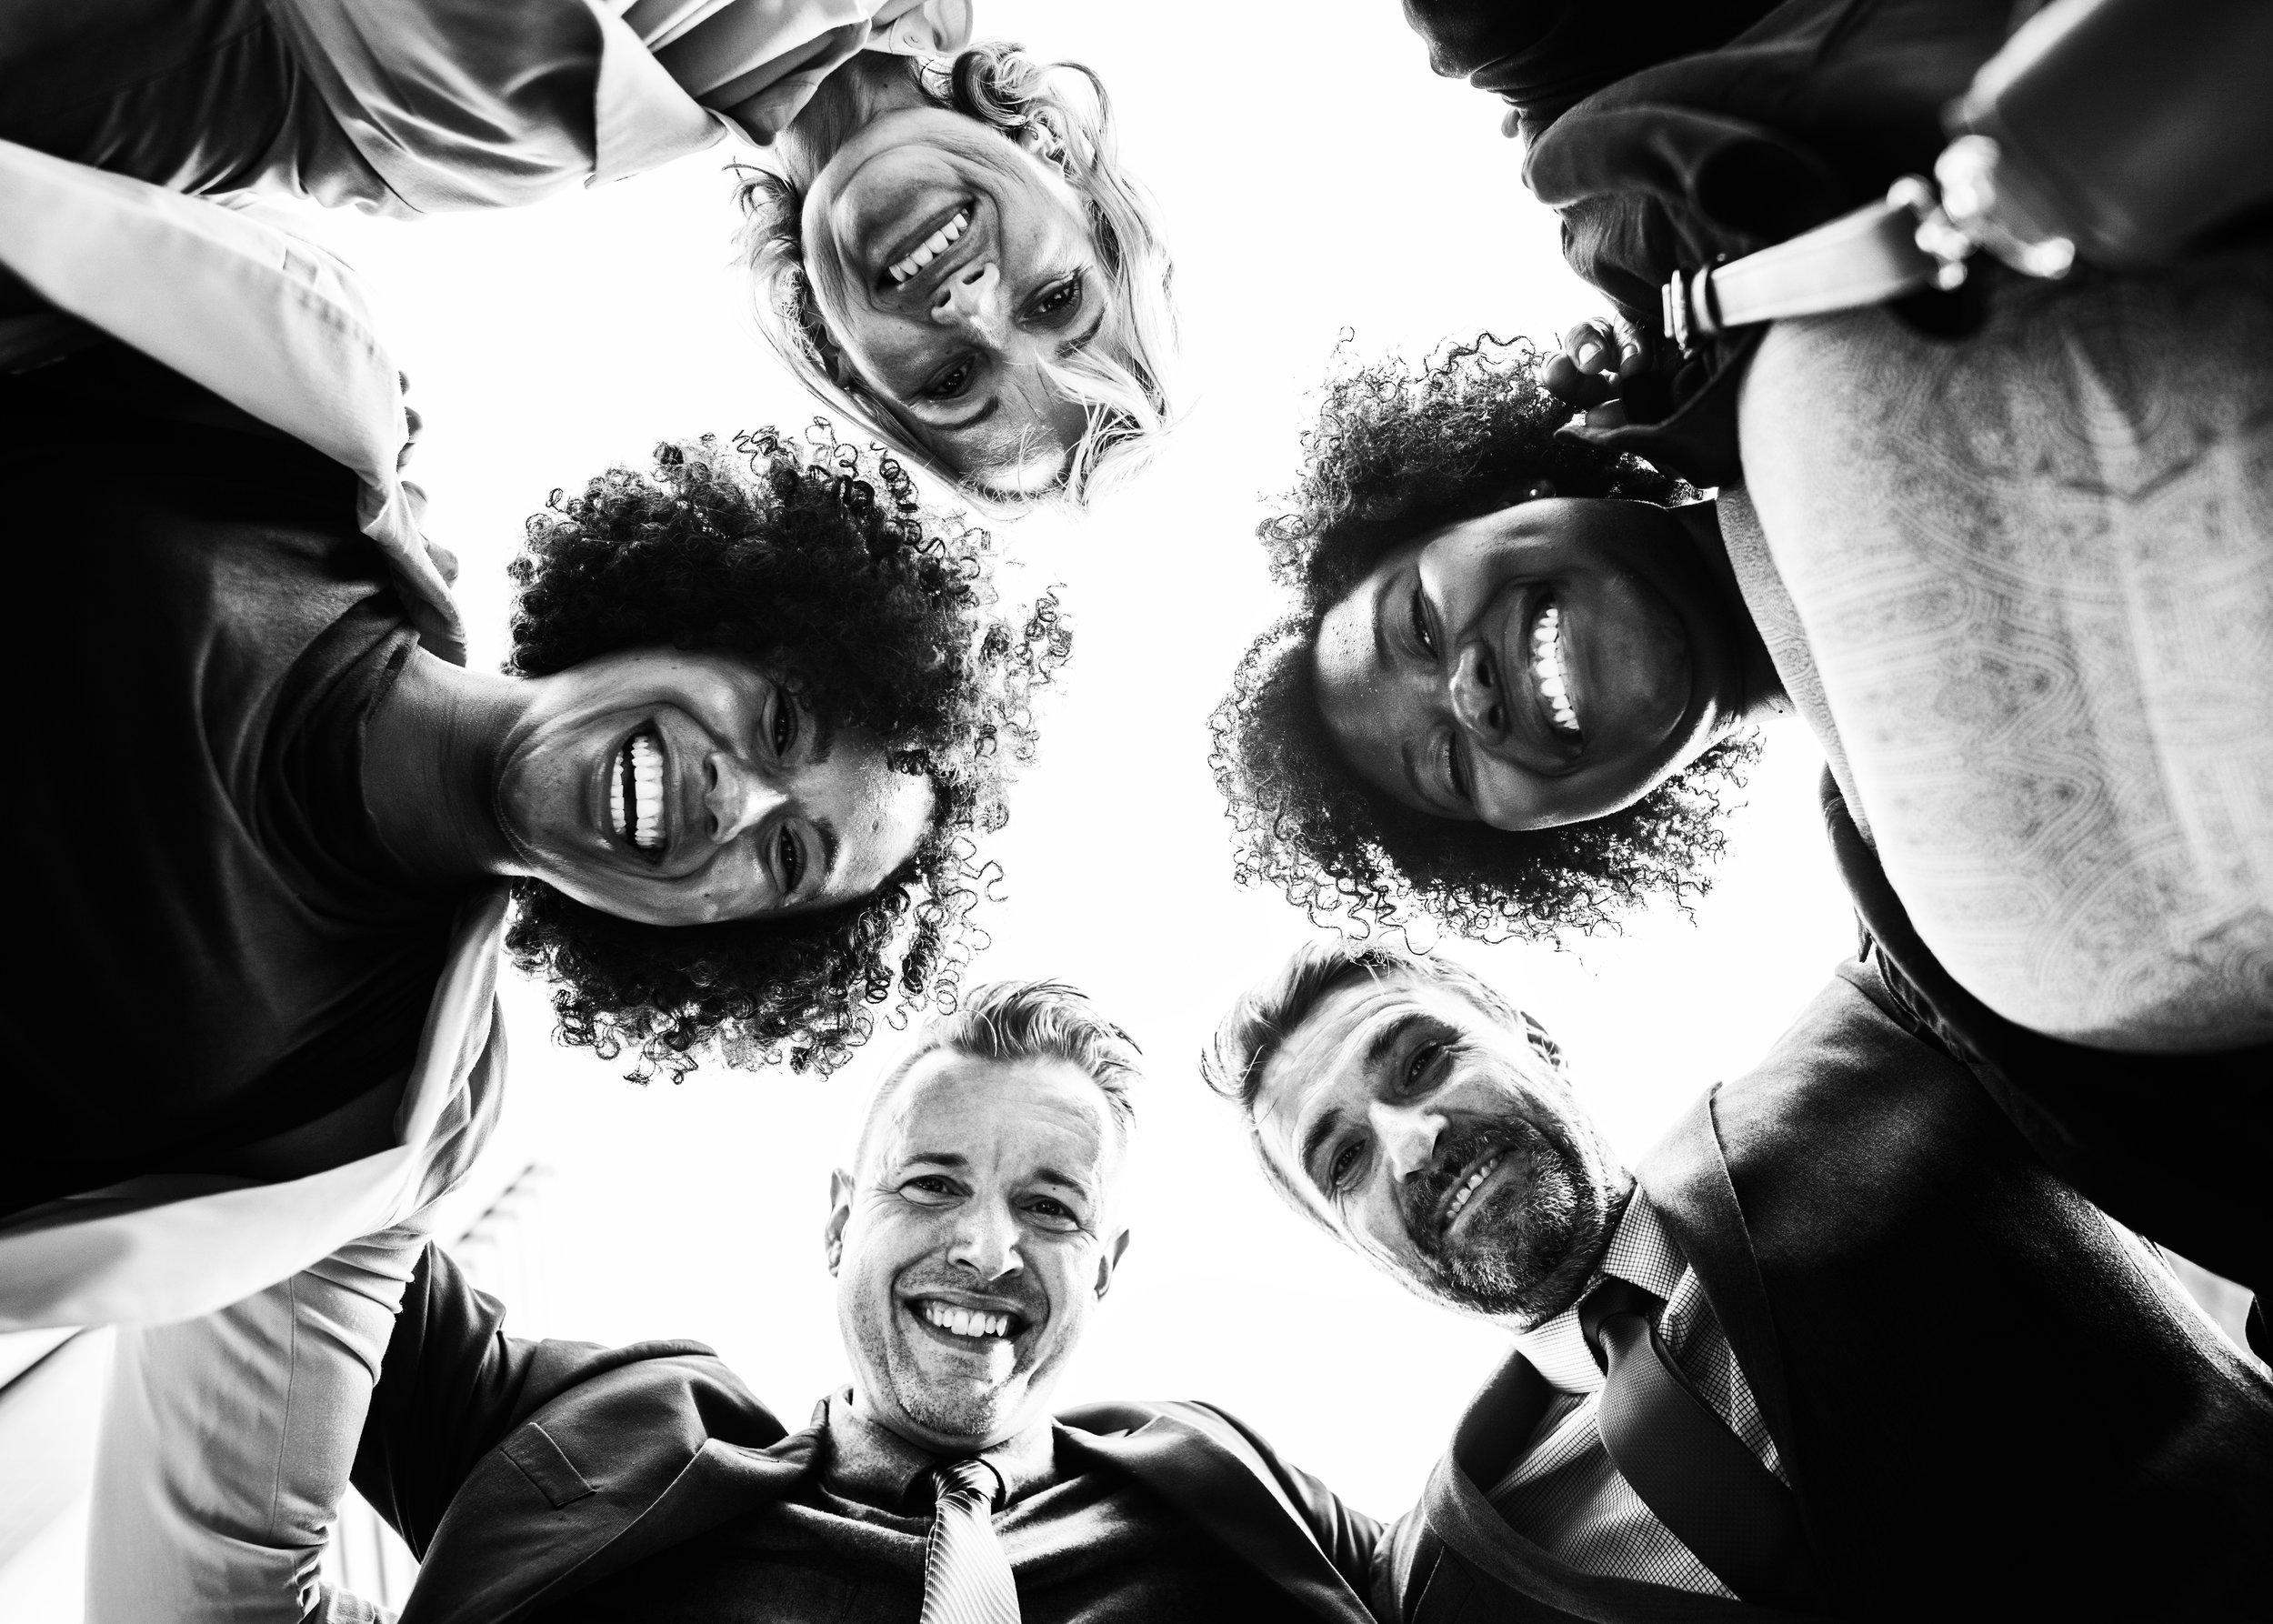 BECOME A MEMBER OF OUR HAPPY TEAM! - Enthousiaste callcenter medewerker 12 - 40 per week, tussen de 10 en 18 euro per uur!